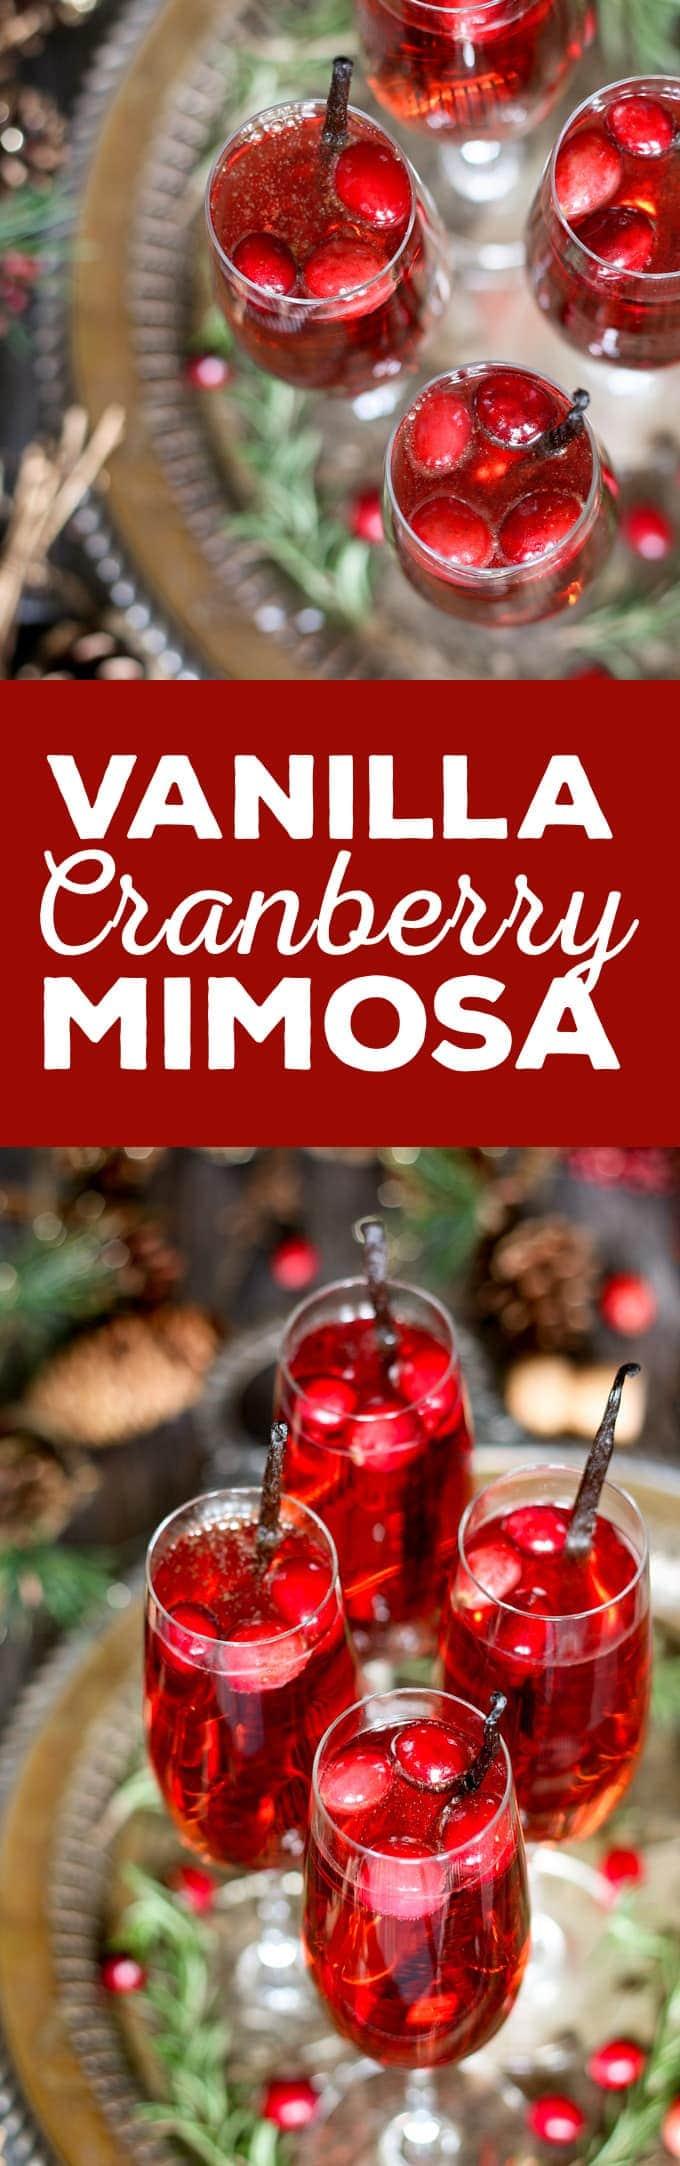 Pinterest image of vanilla cranberry mimosa